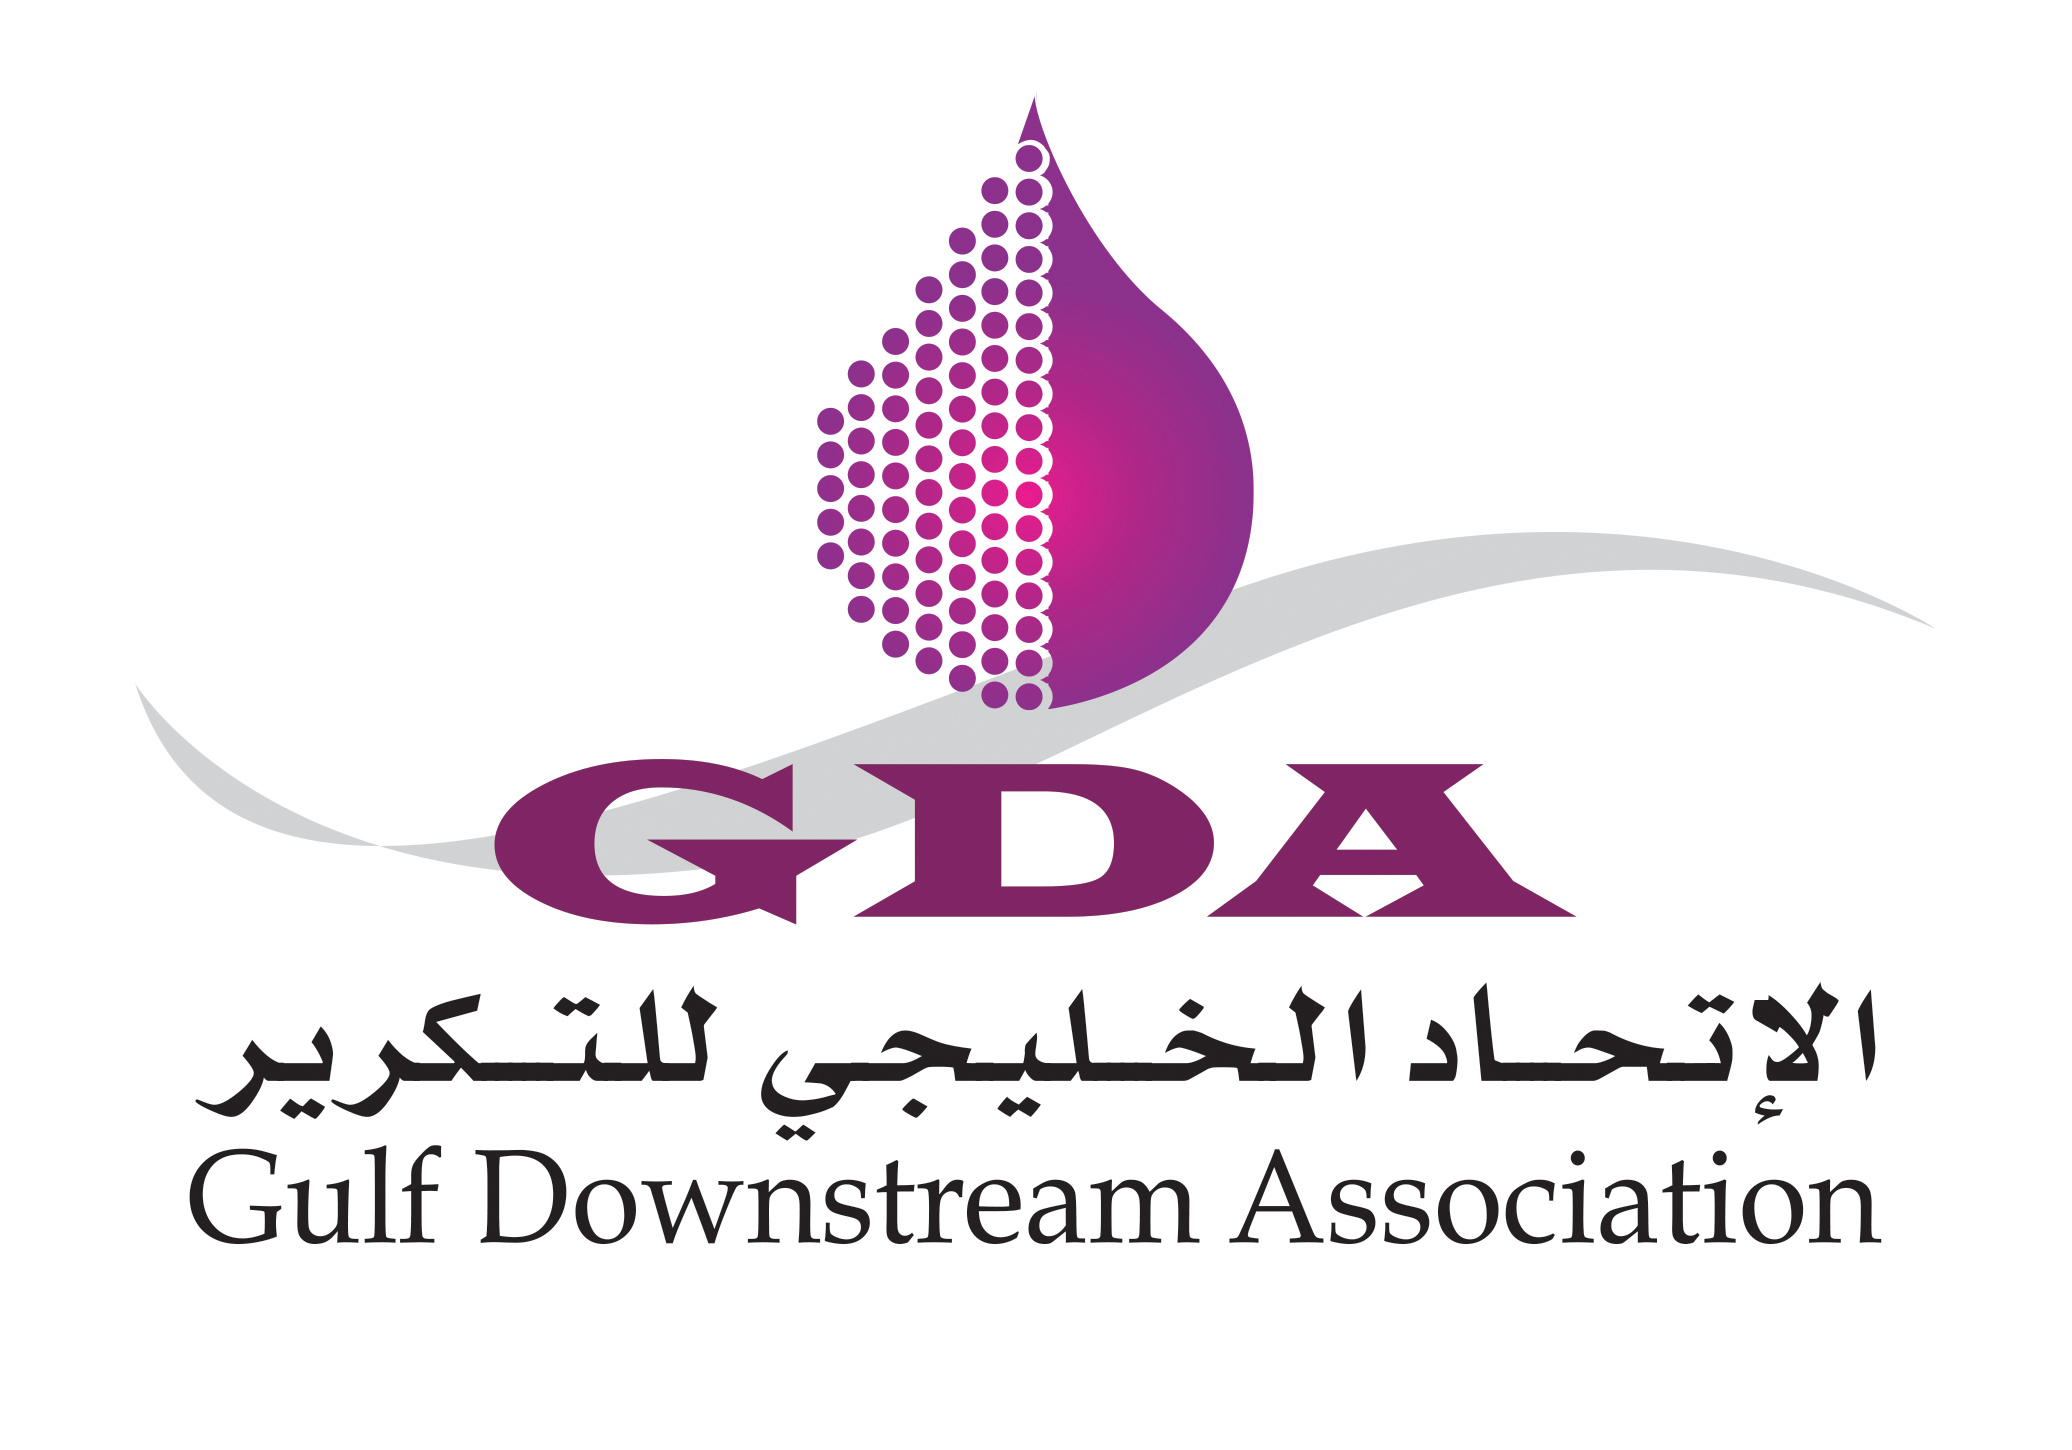 GDA-Logo-final-13-12-17-2.jpg